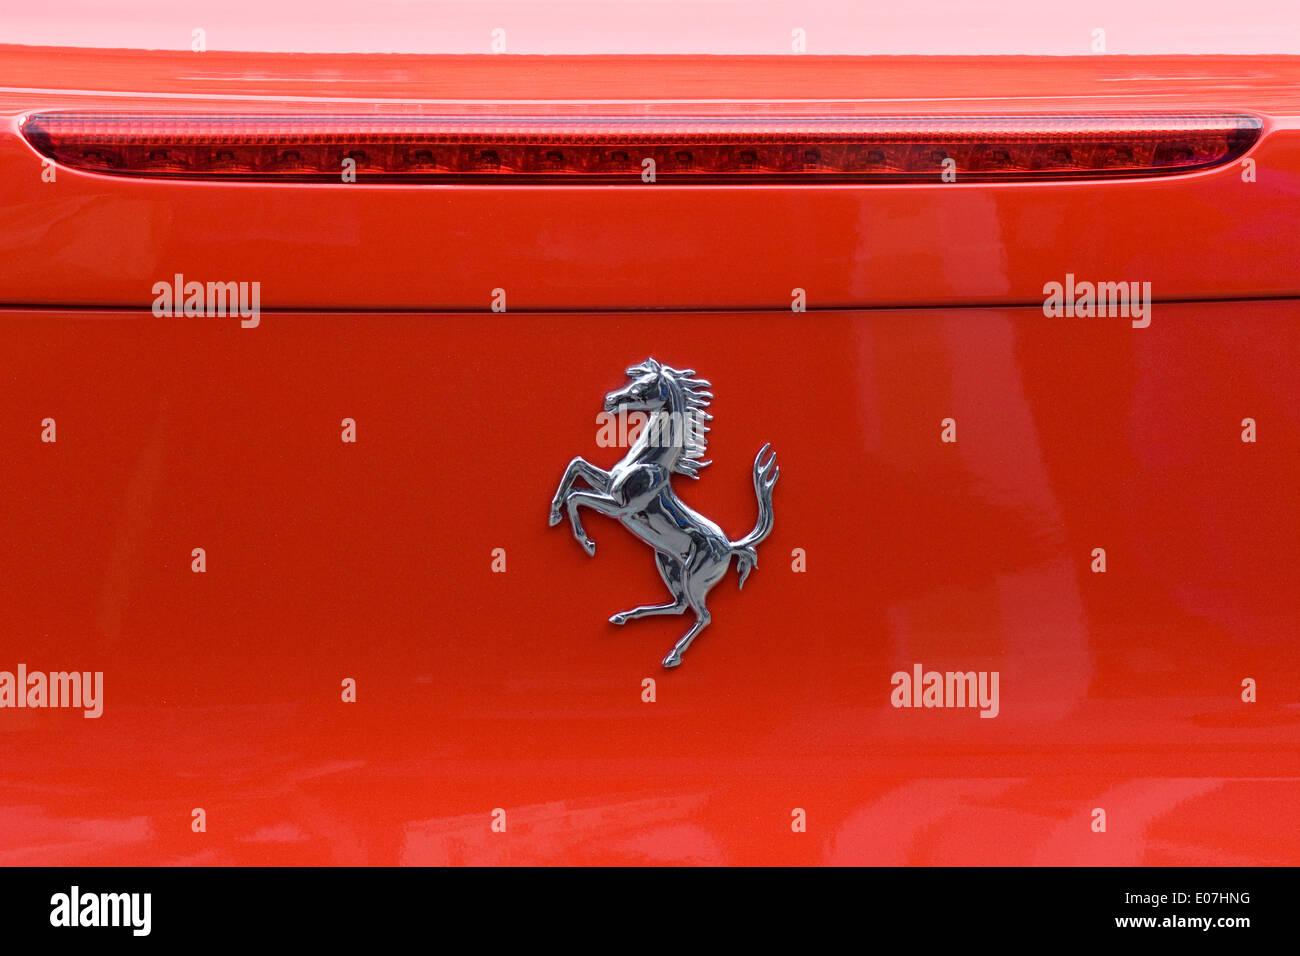 Ferrari name badge and horse logo ferrari 458 italia stock photo ferrari name badge and horse logo ferrari 458 italia biocorpaavc Gallery